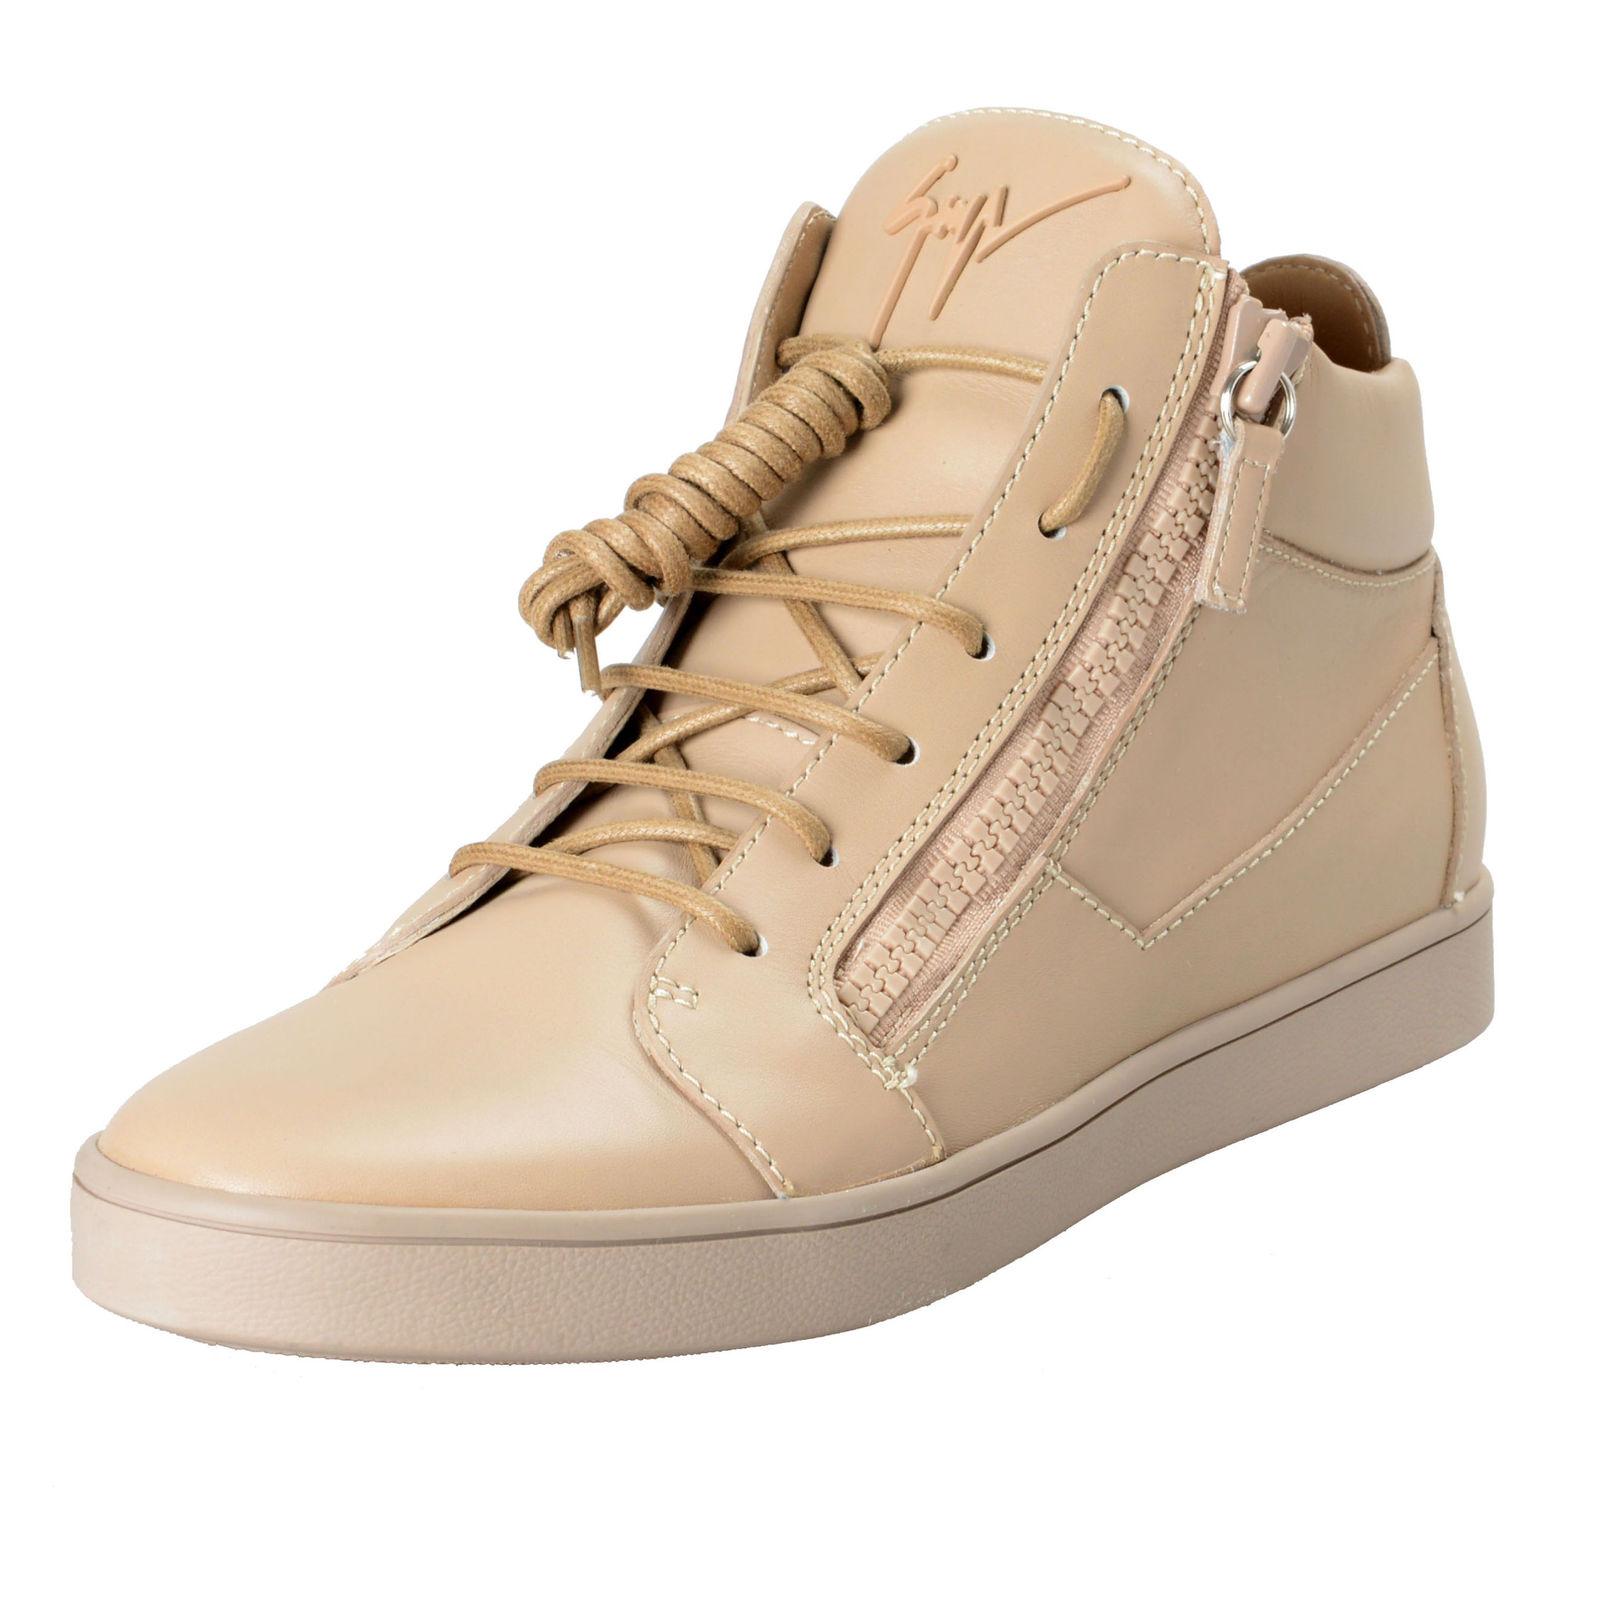 fc0f0b23fe2f9 Giuseppe Zanotti Men's Beige Leather Hi Top Fashion Sneakers Shoes US 9 IT  ...